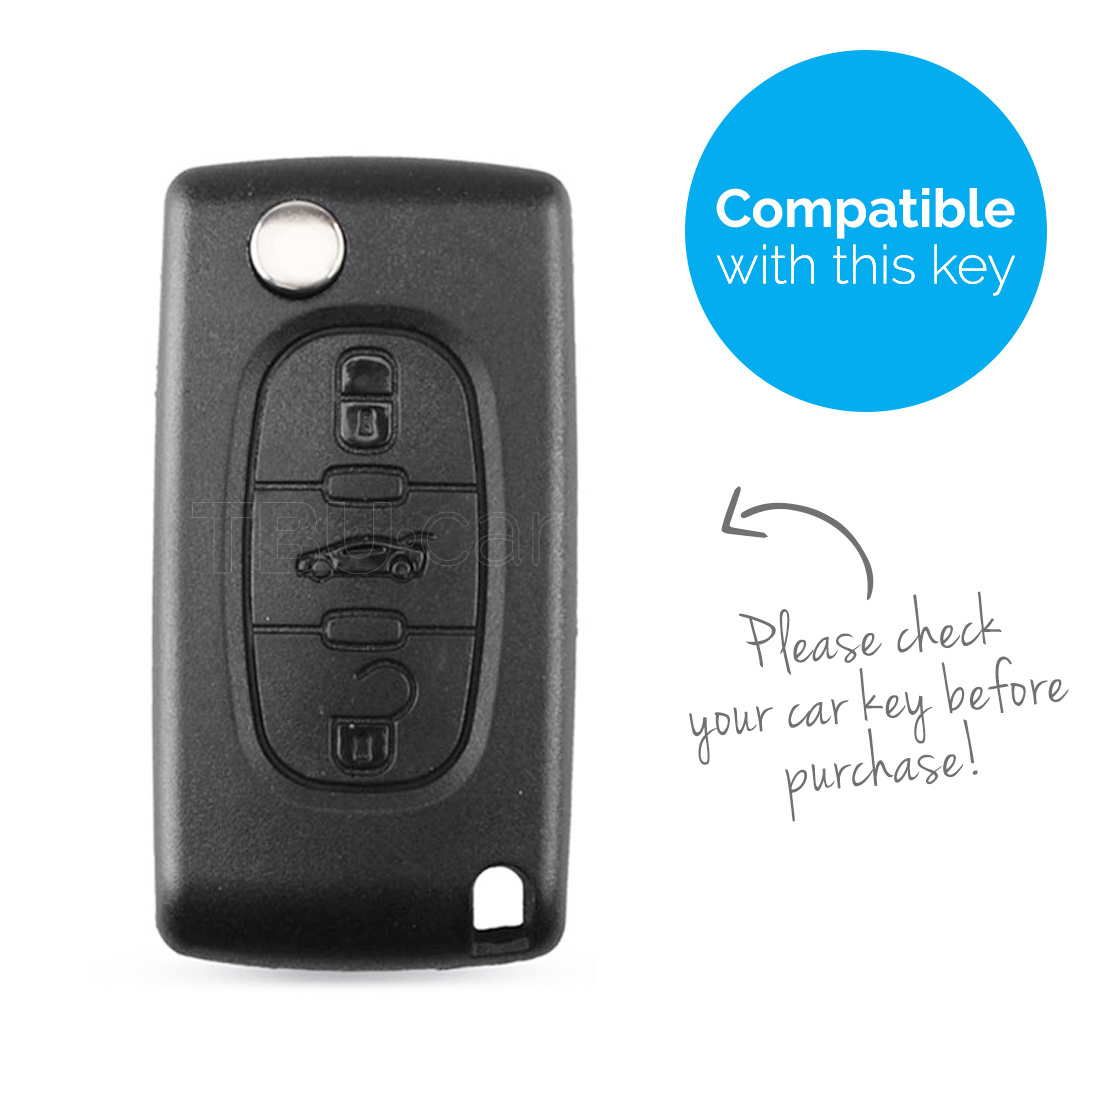 TBU car TBU car Autoschlüssel Hülle kompatibel mit Peugeot 3 Tasten - Schutzhülle aus Silikon - Auto Schlüsselhülle Cover in Schwarz